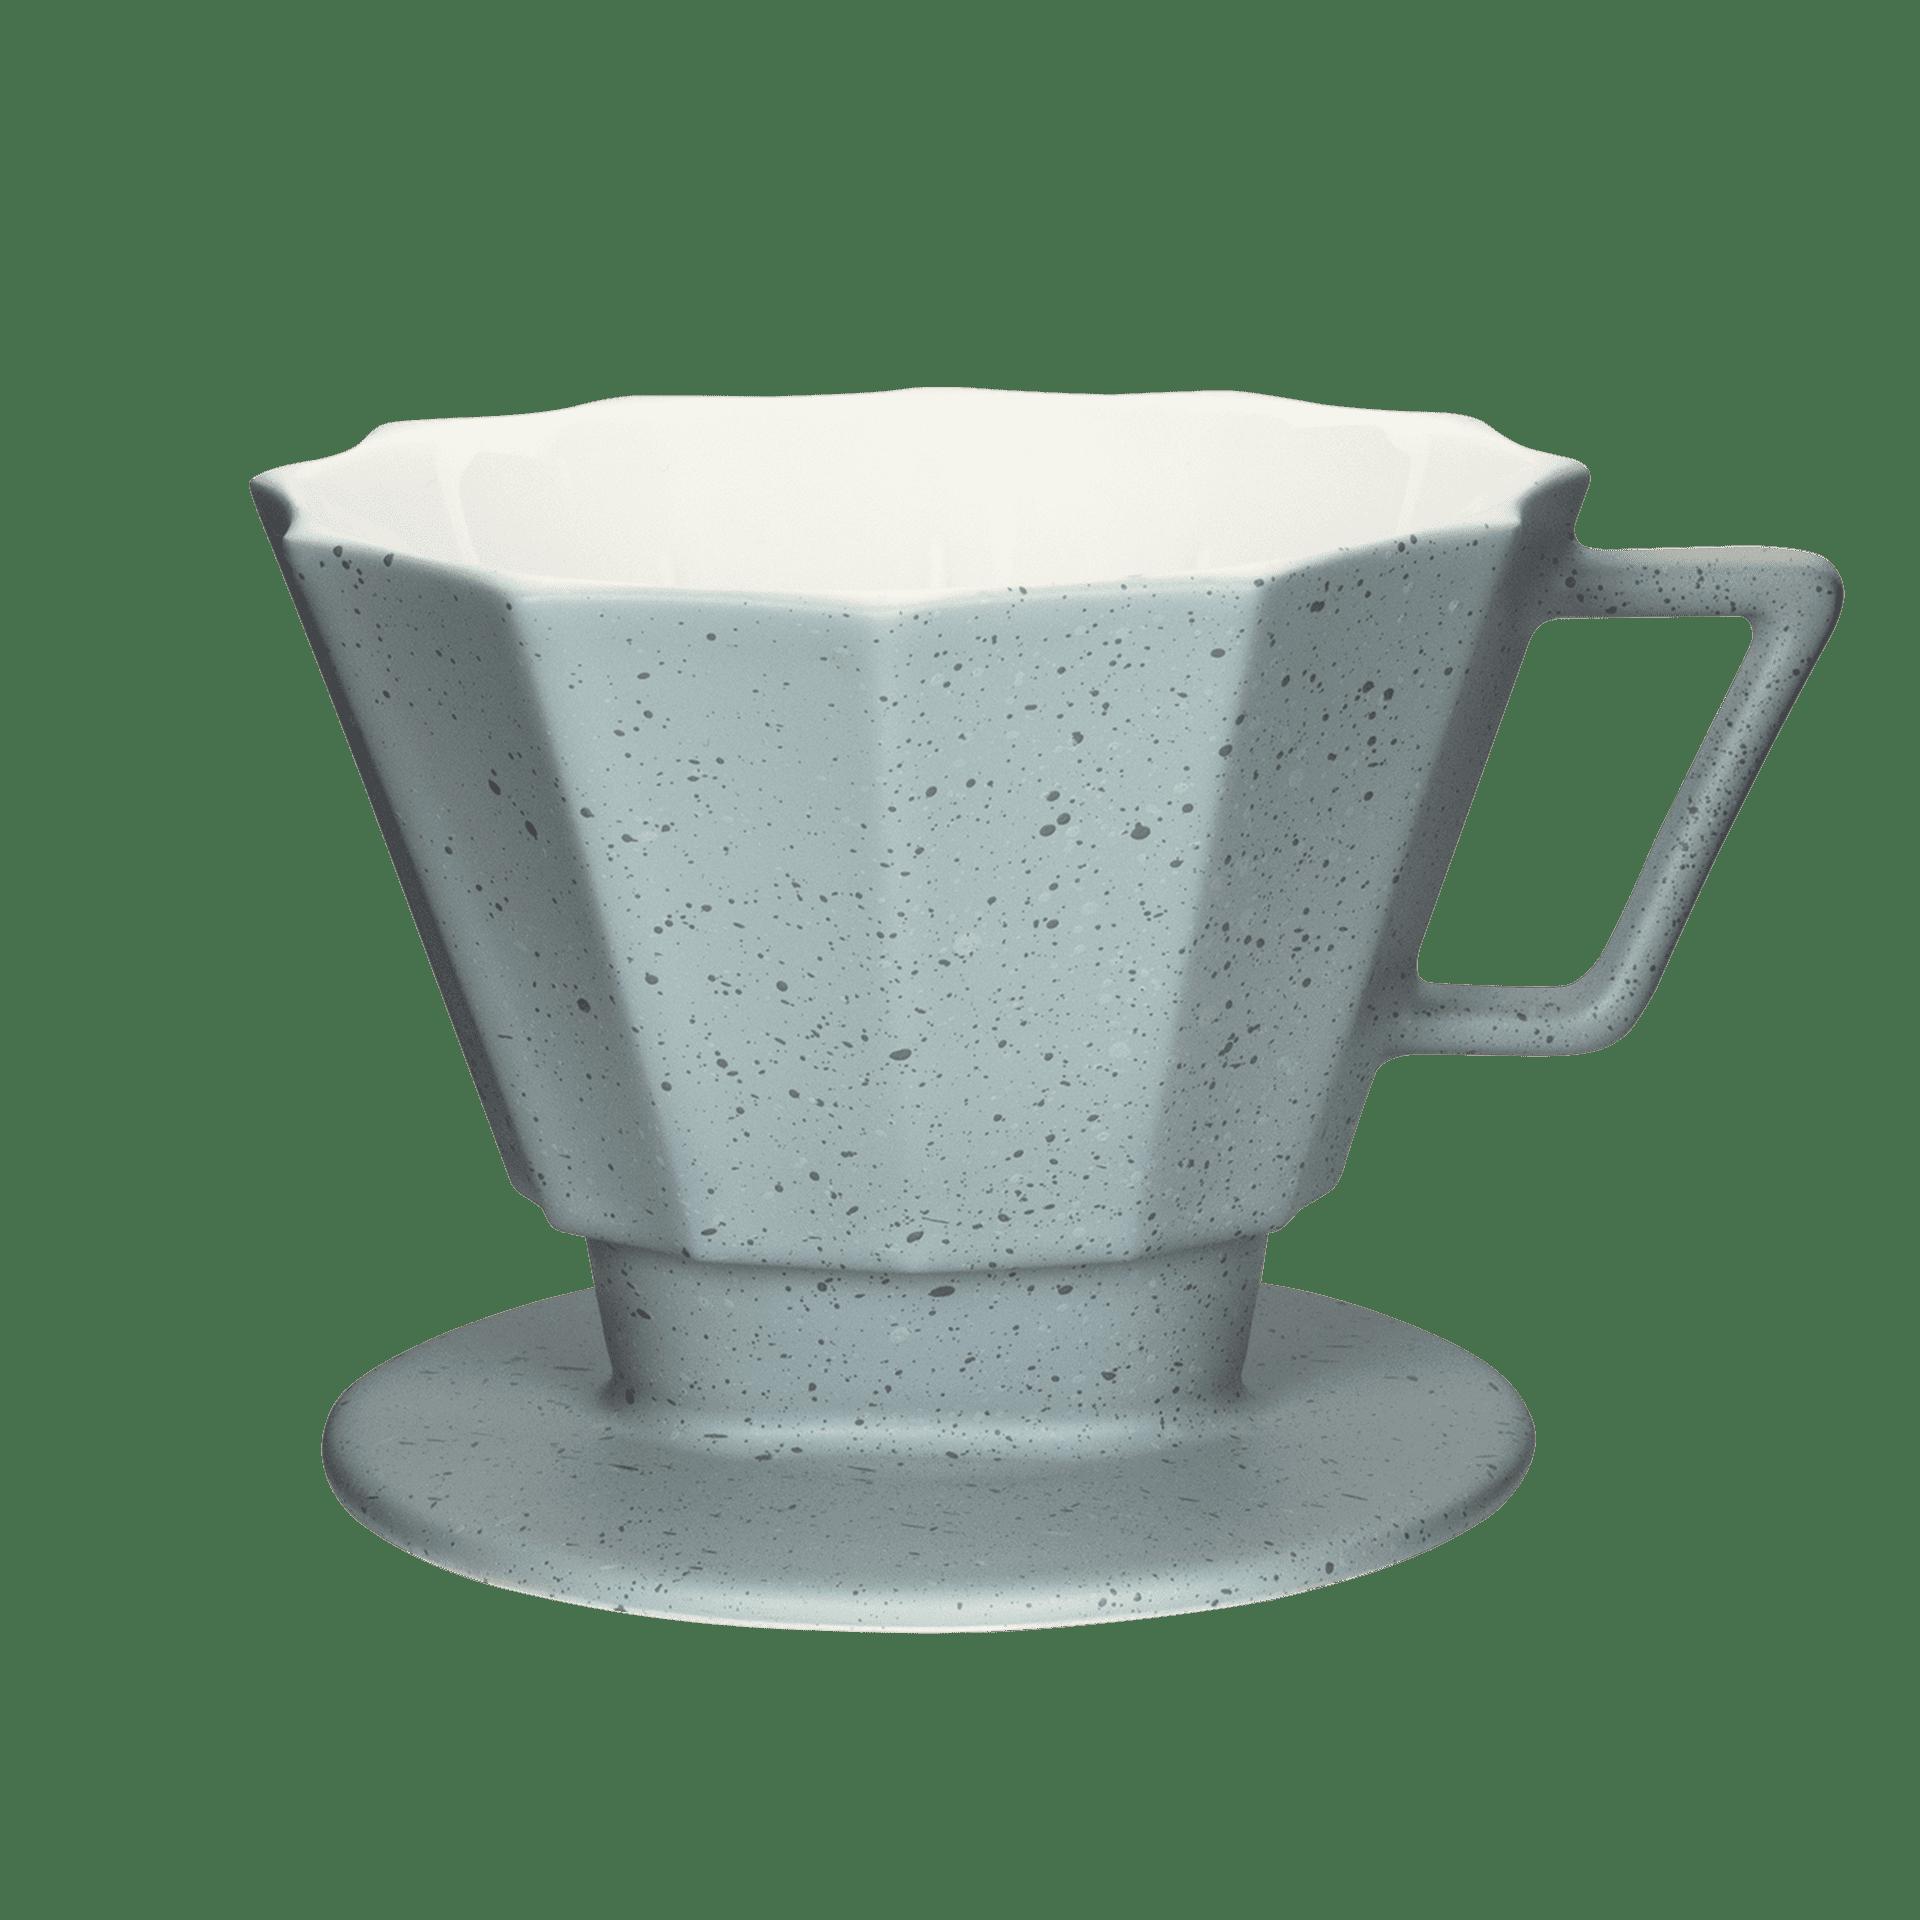 abstrakter und eckiger kaffee-filter in grau-matt groesse 4 1x4